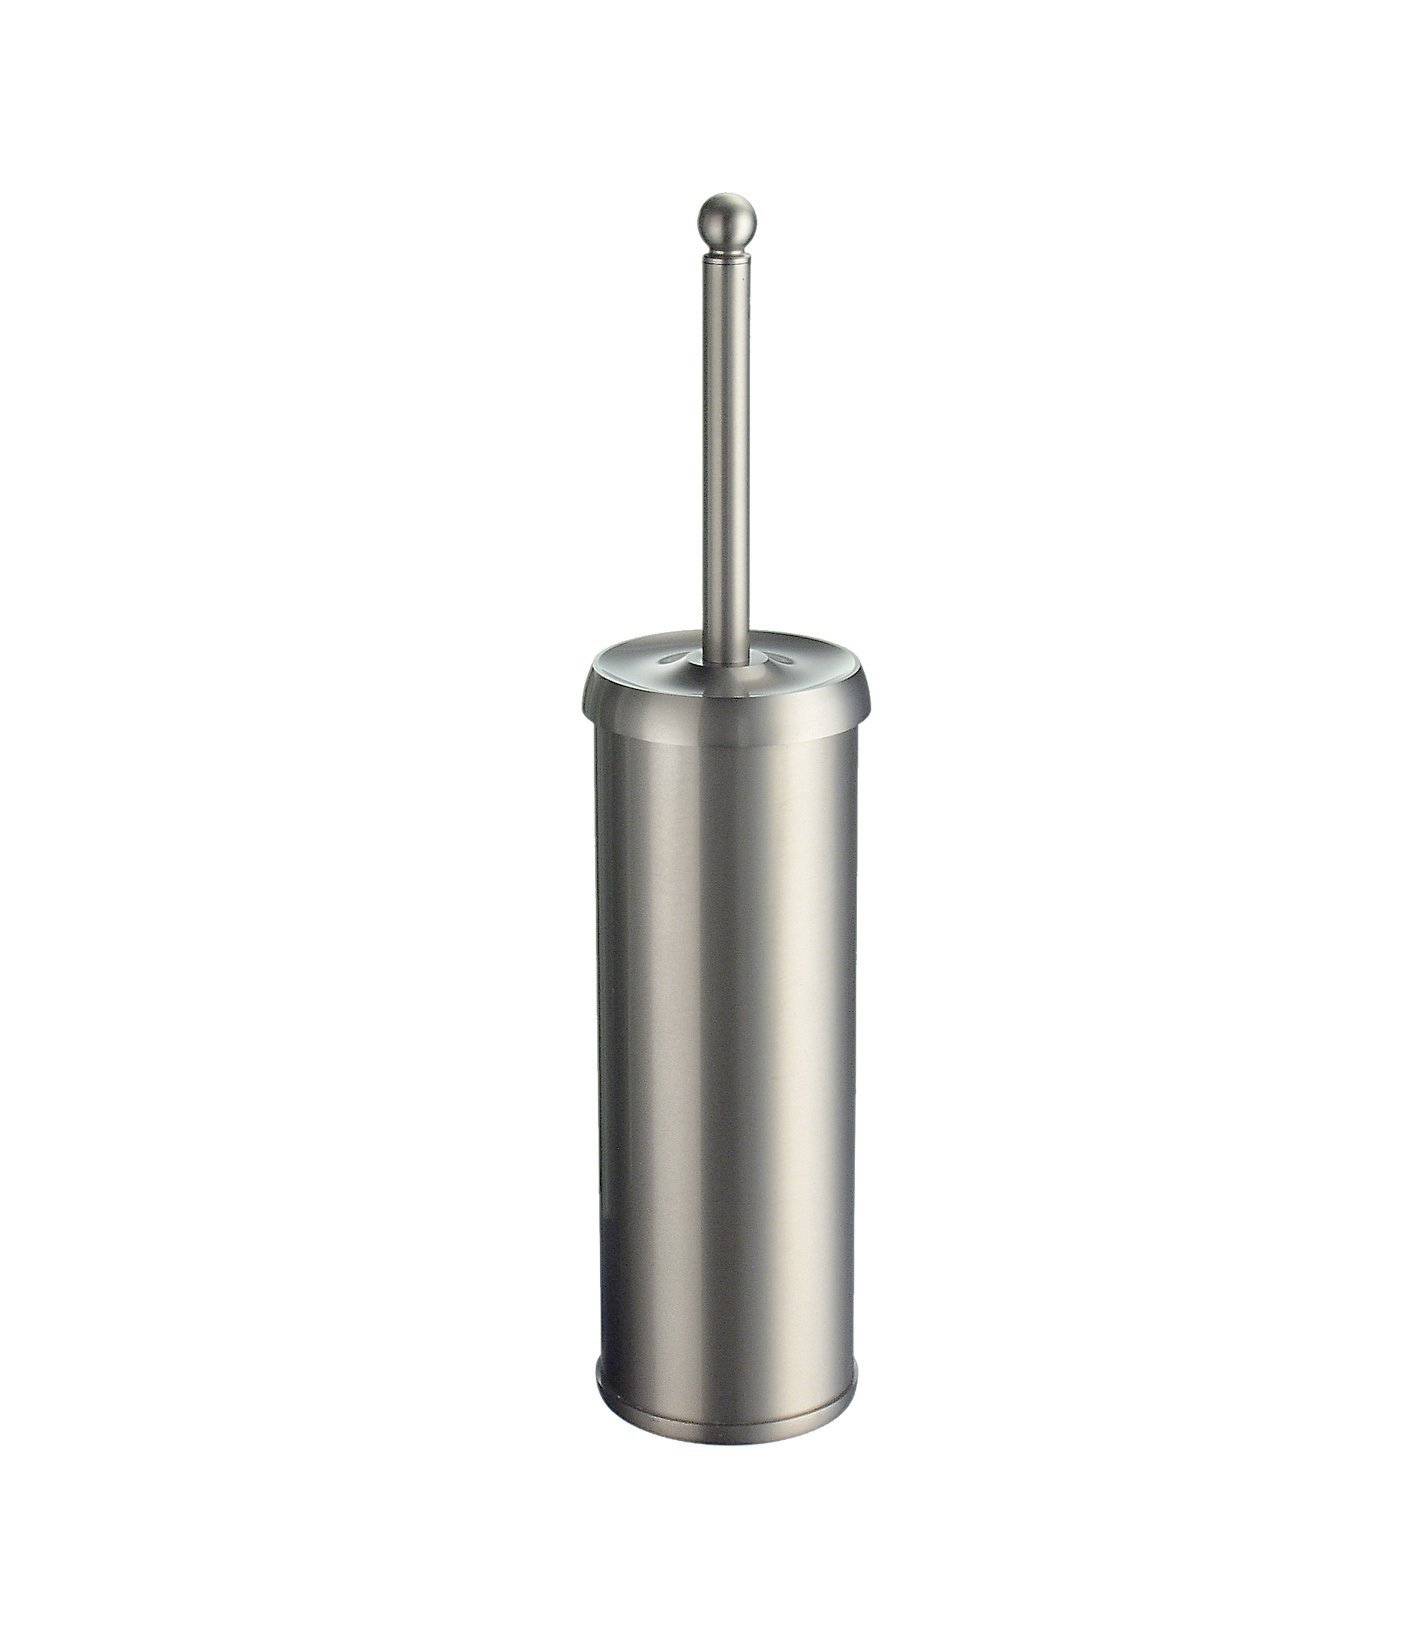 Smedbo SME V233N Toilet Free Standing, Brushed Nickel